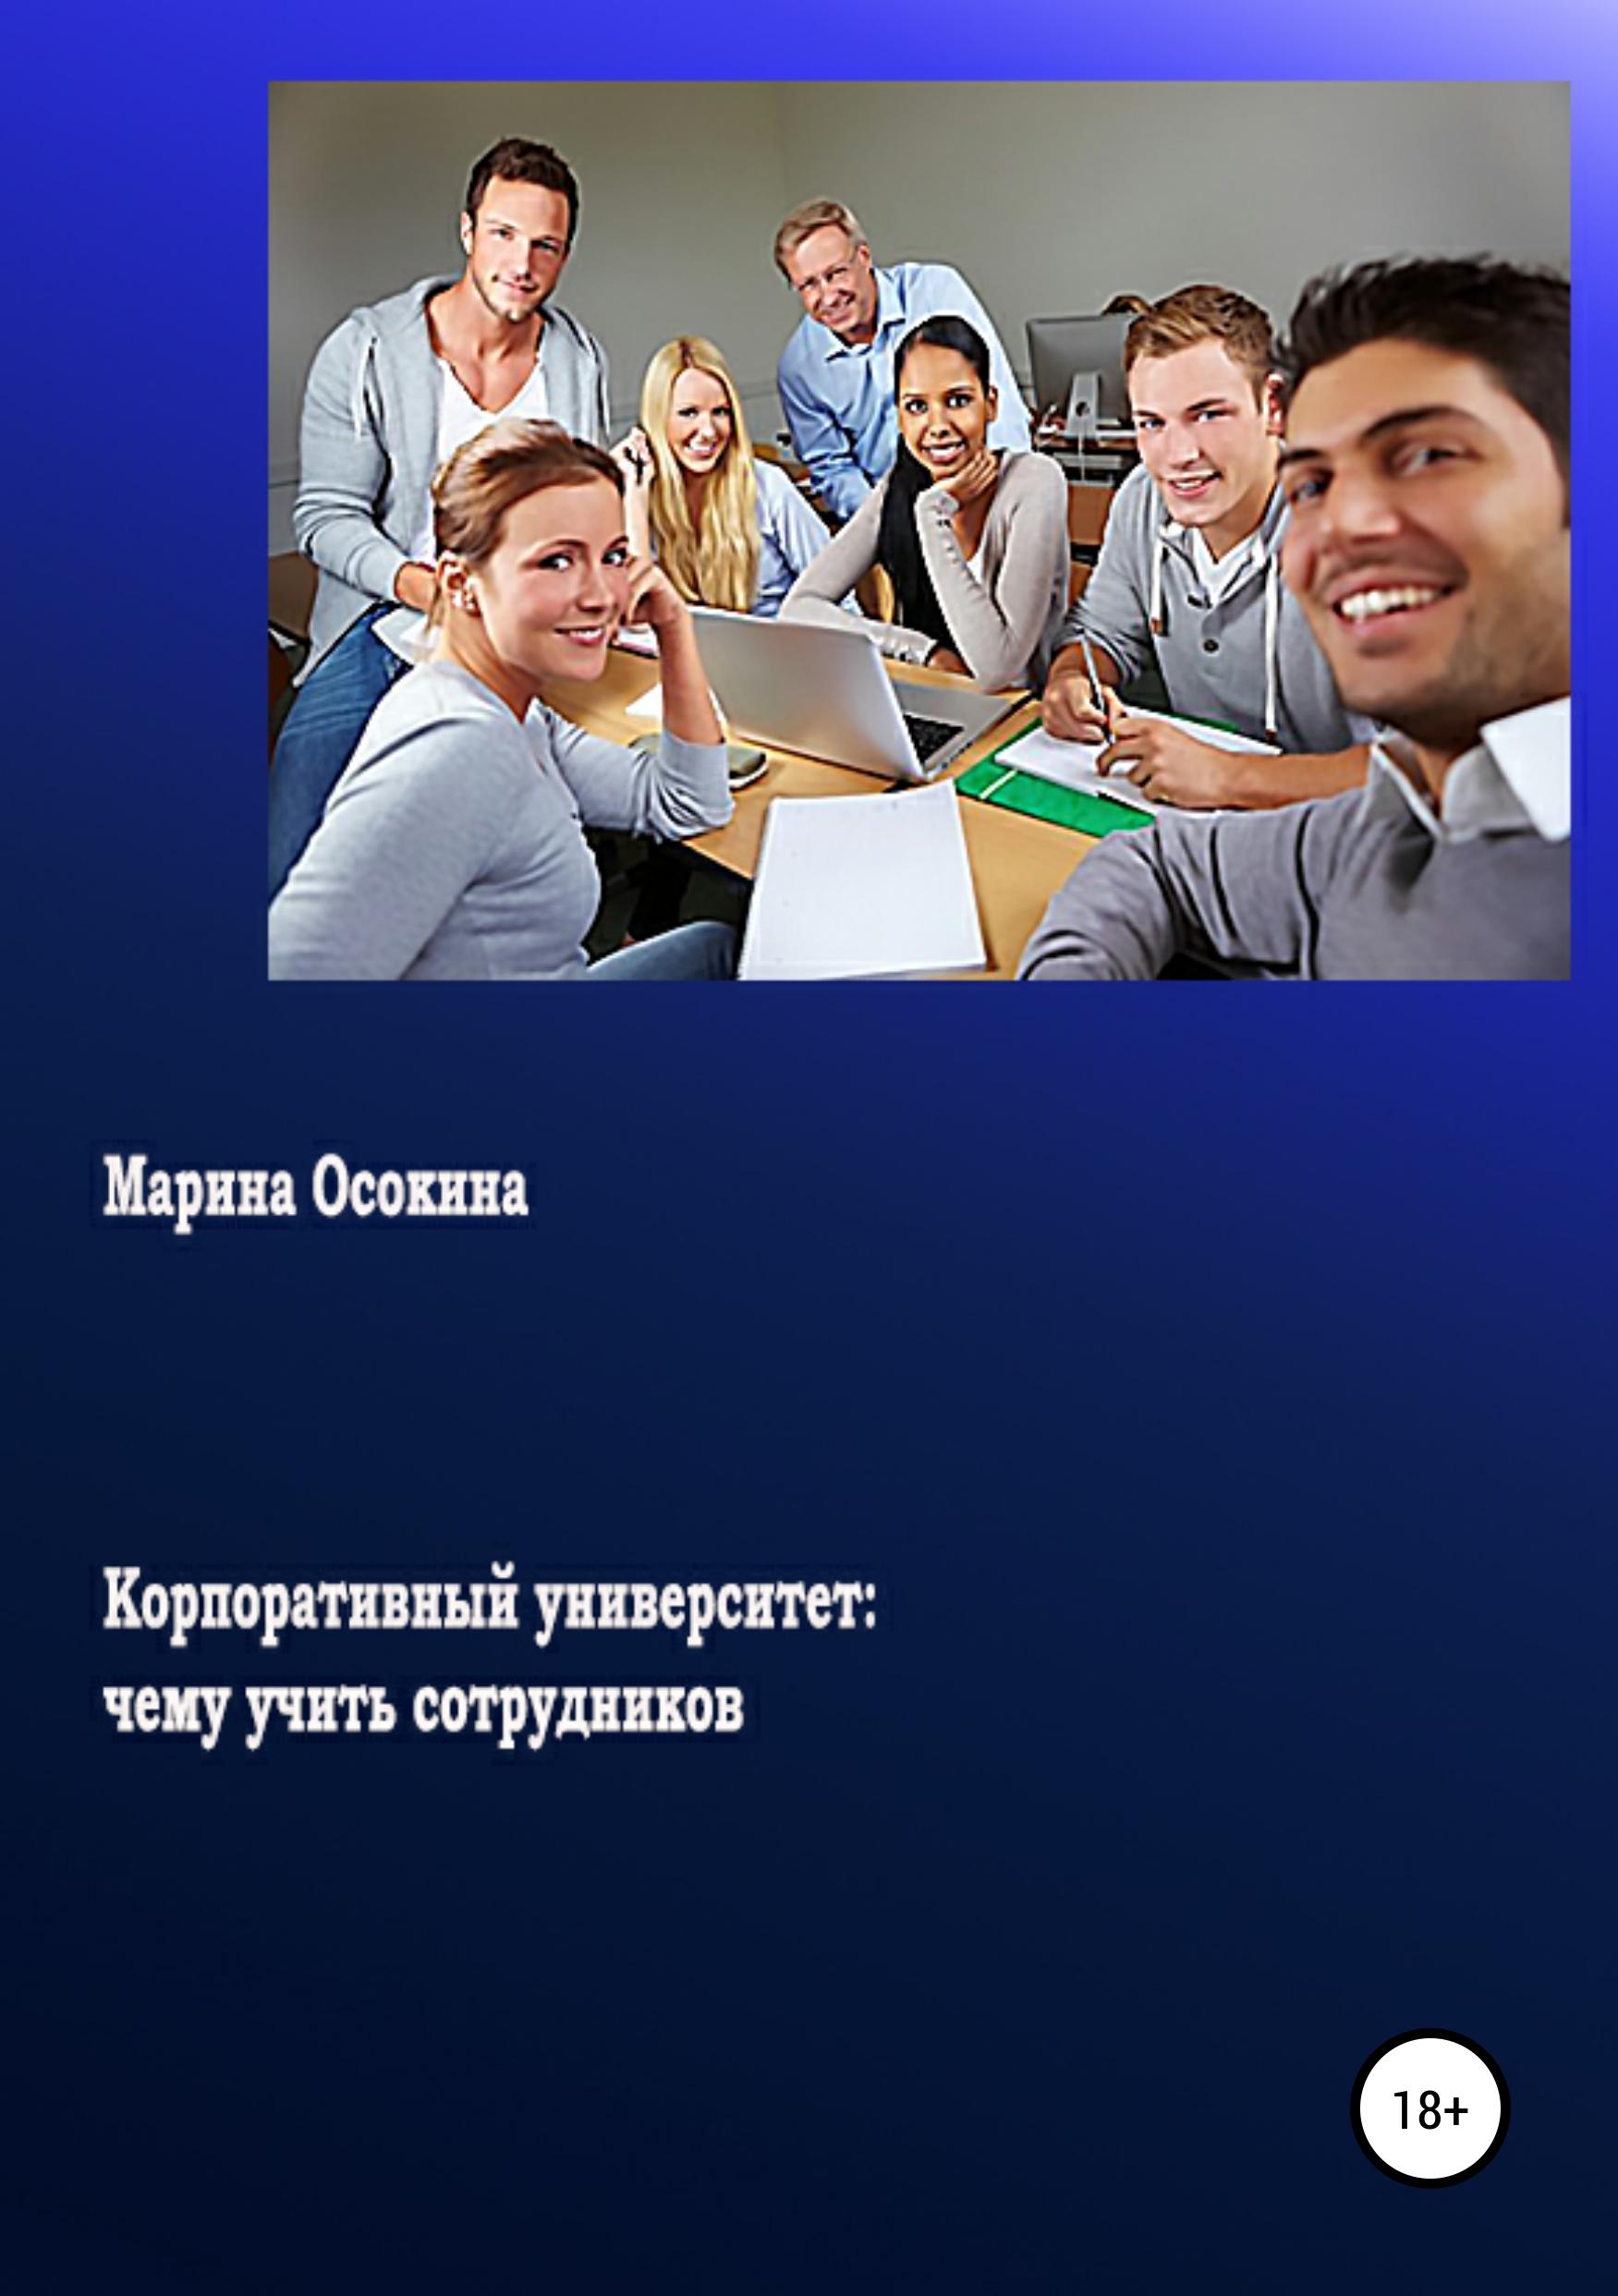 Обложка книги. Автор - Марина Осокина